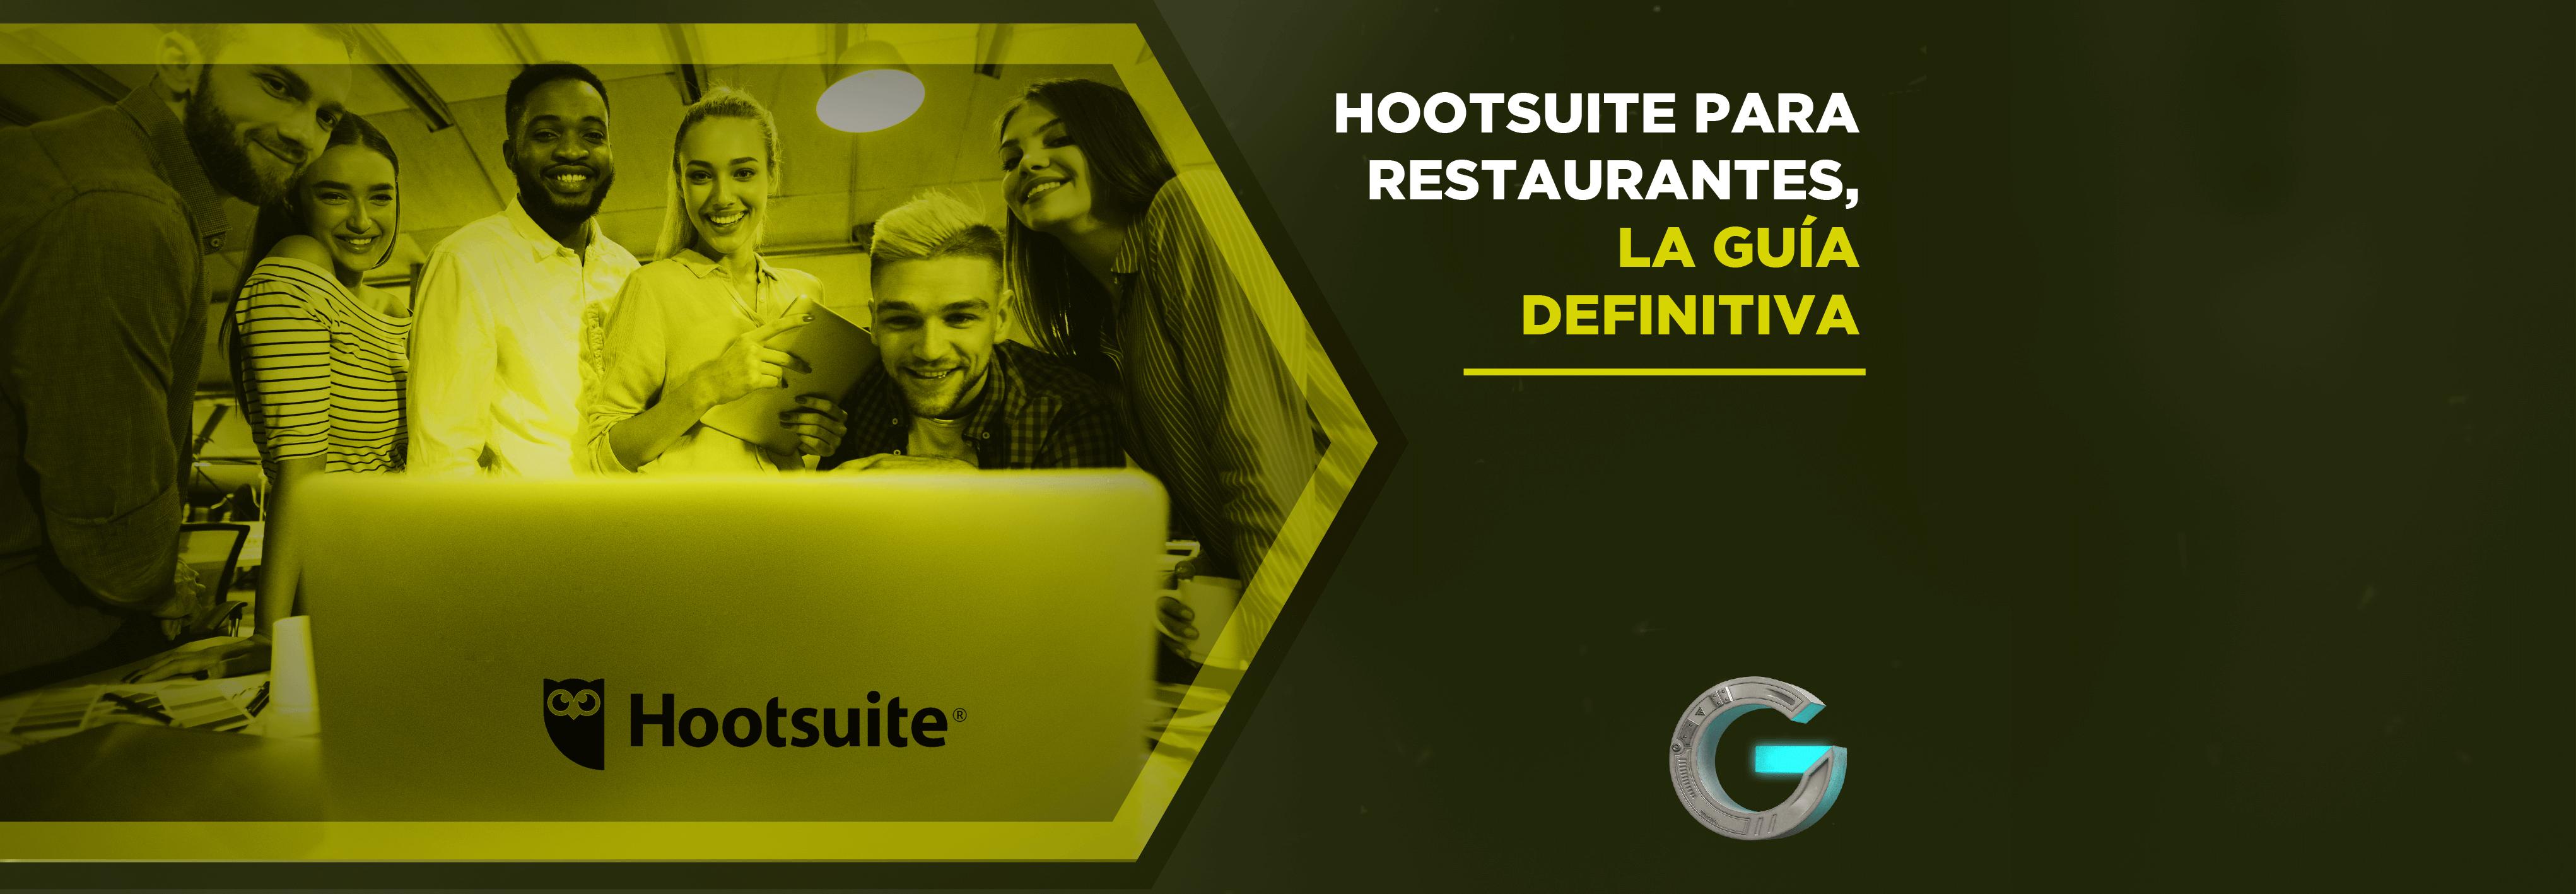 hootsuite restaurantes